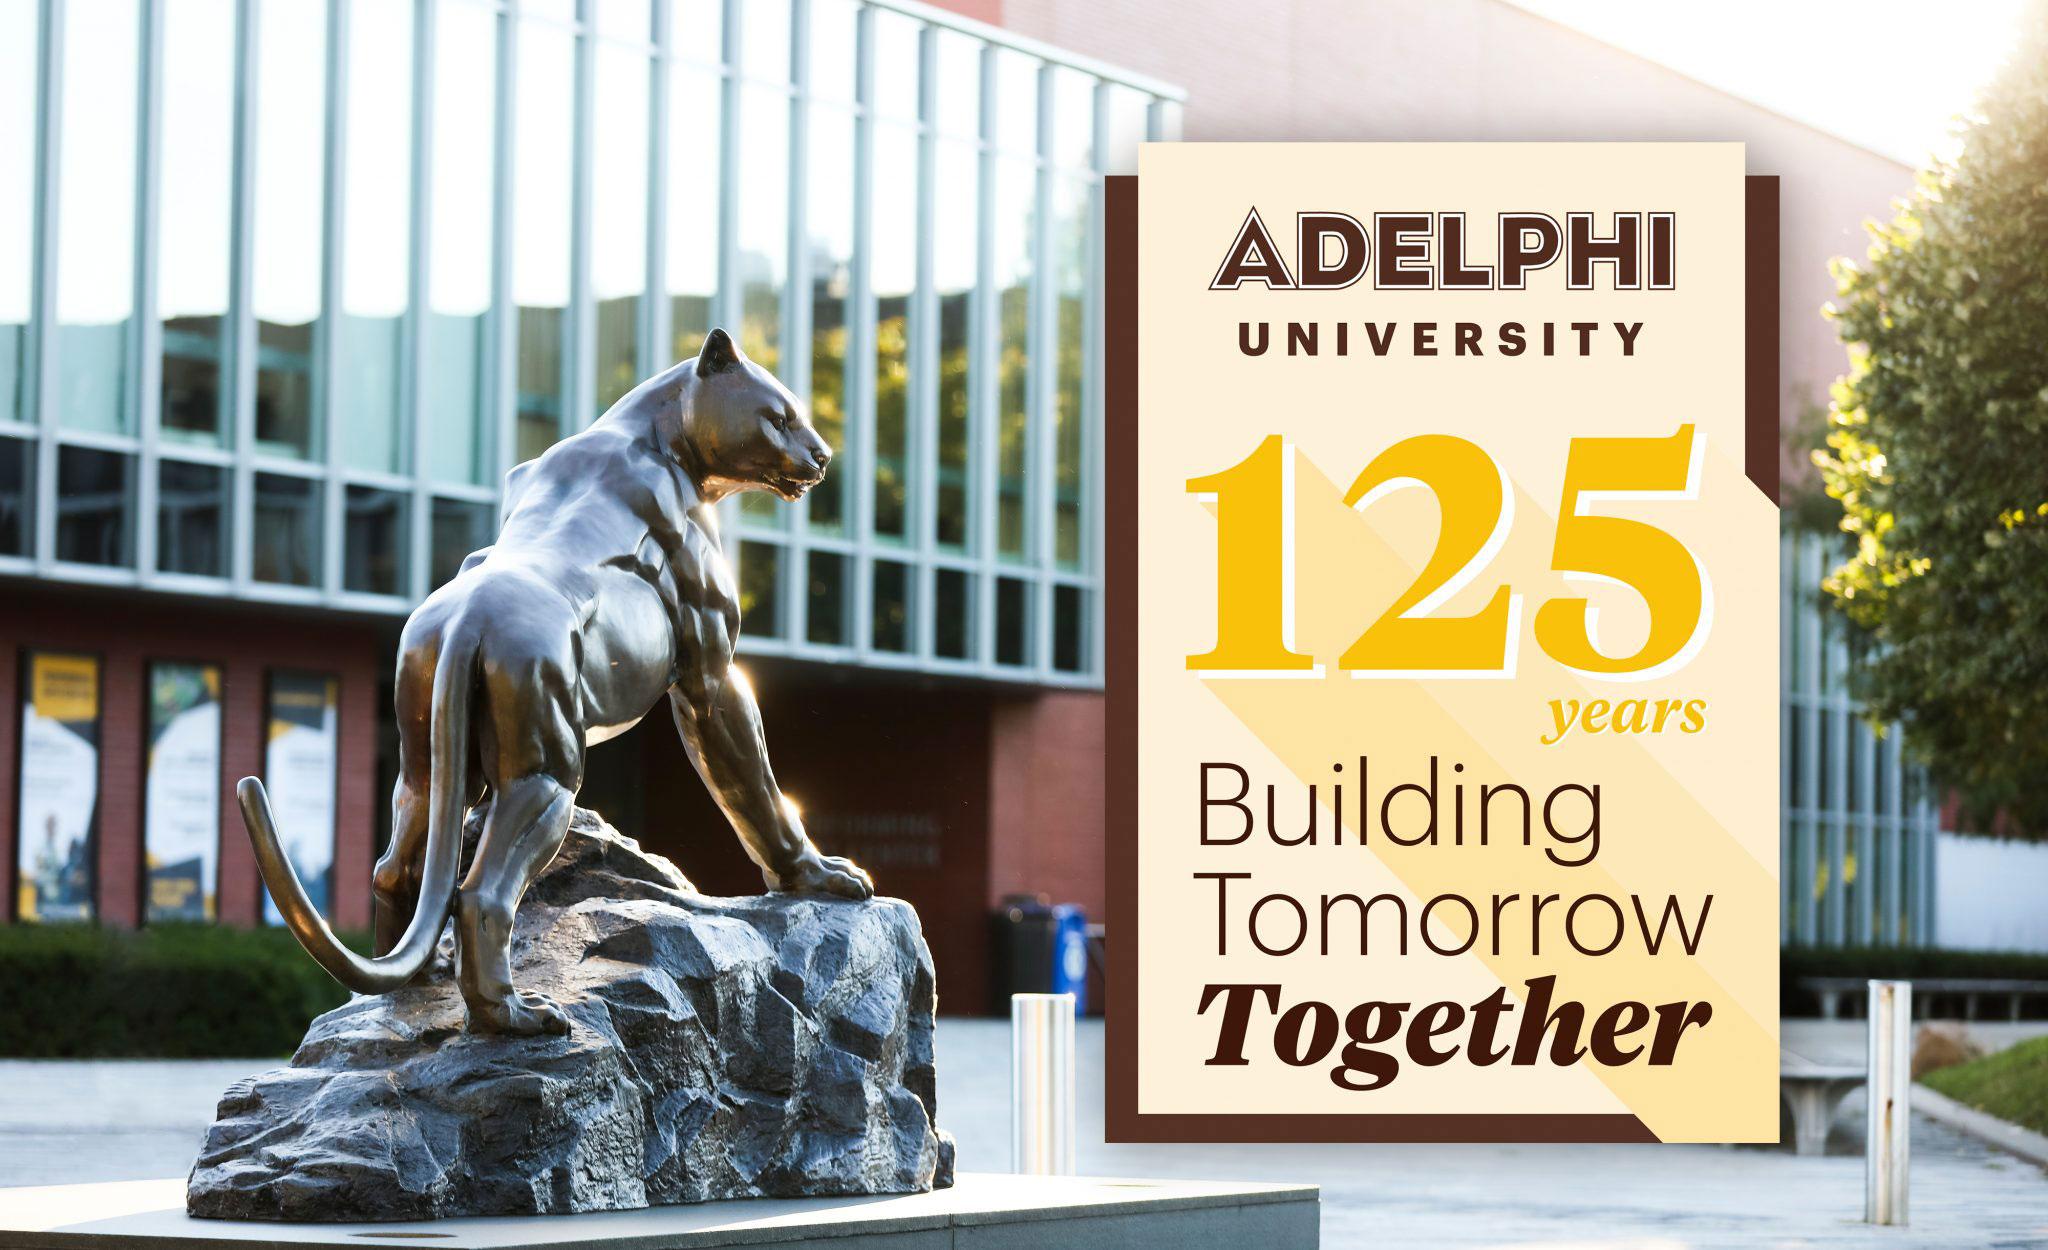 Adelphi University 125 year: Building Tomorrow Together